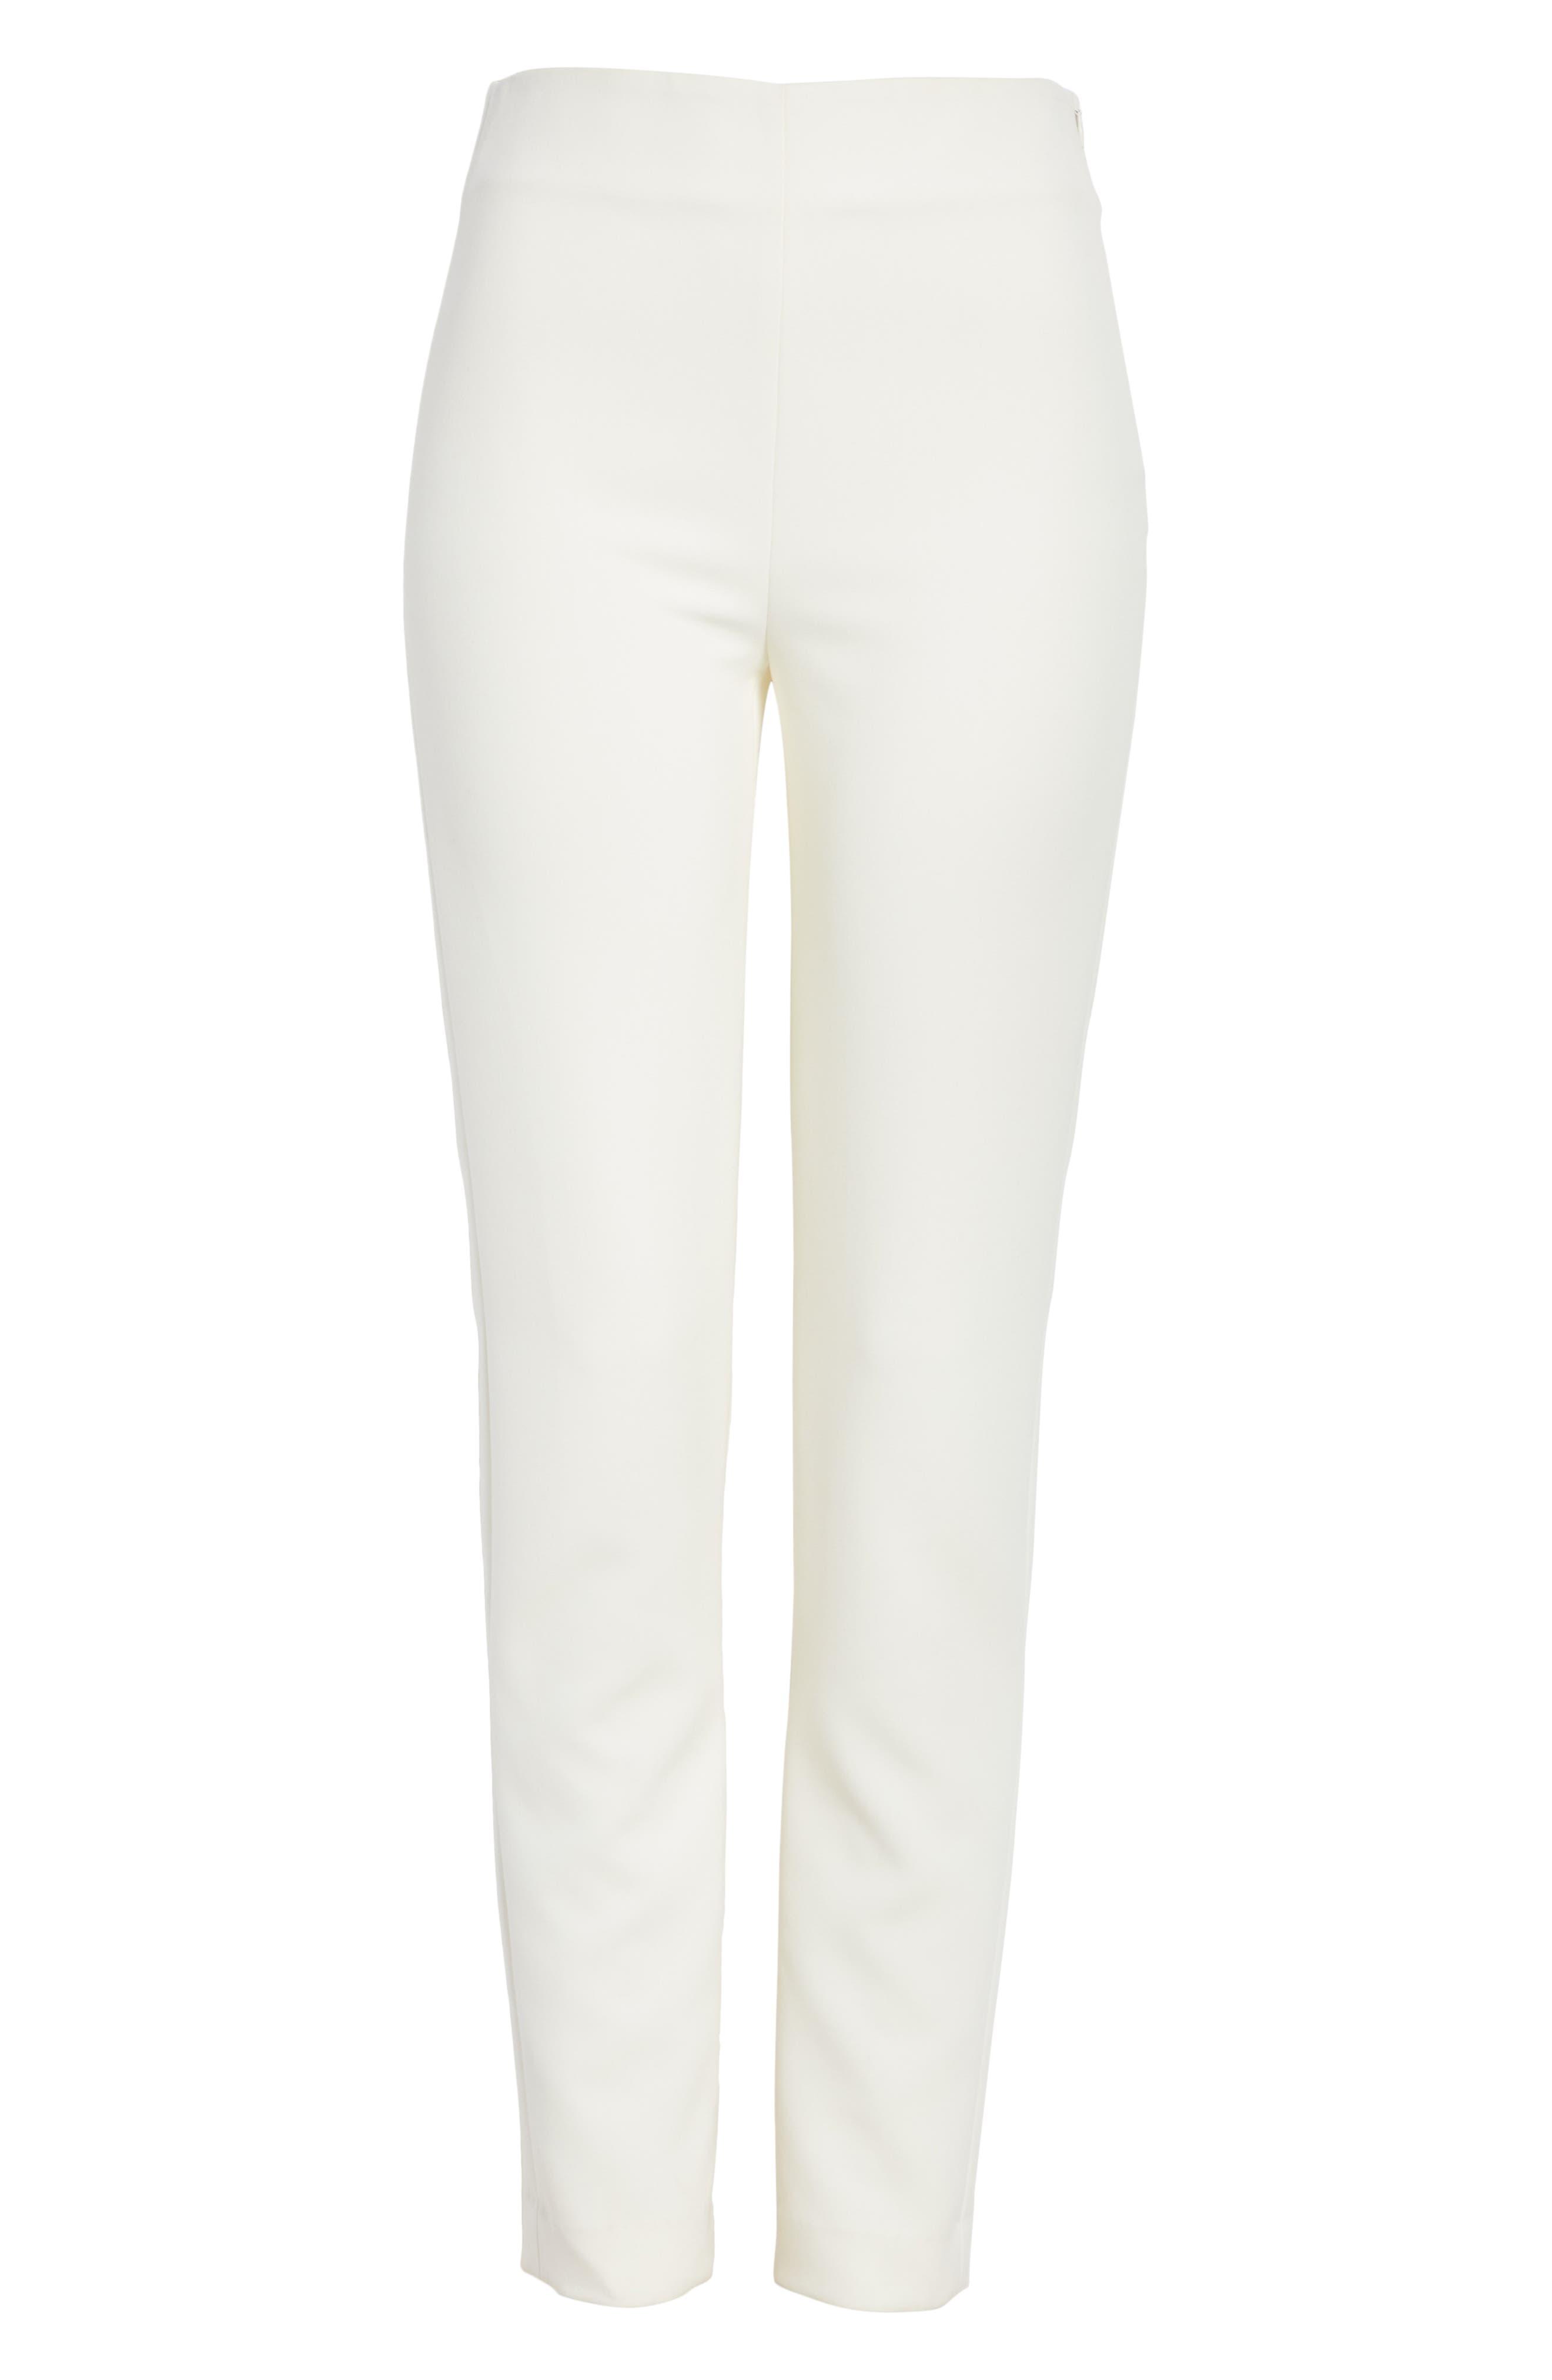 ST. JOHN COLLECTION, Bella Double Weave Skinny Pants, Alternate thumbnail 6, color, CREAM